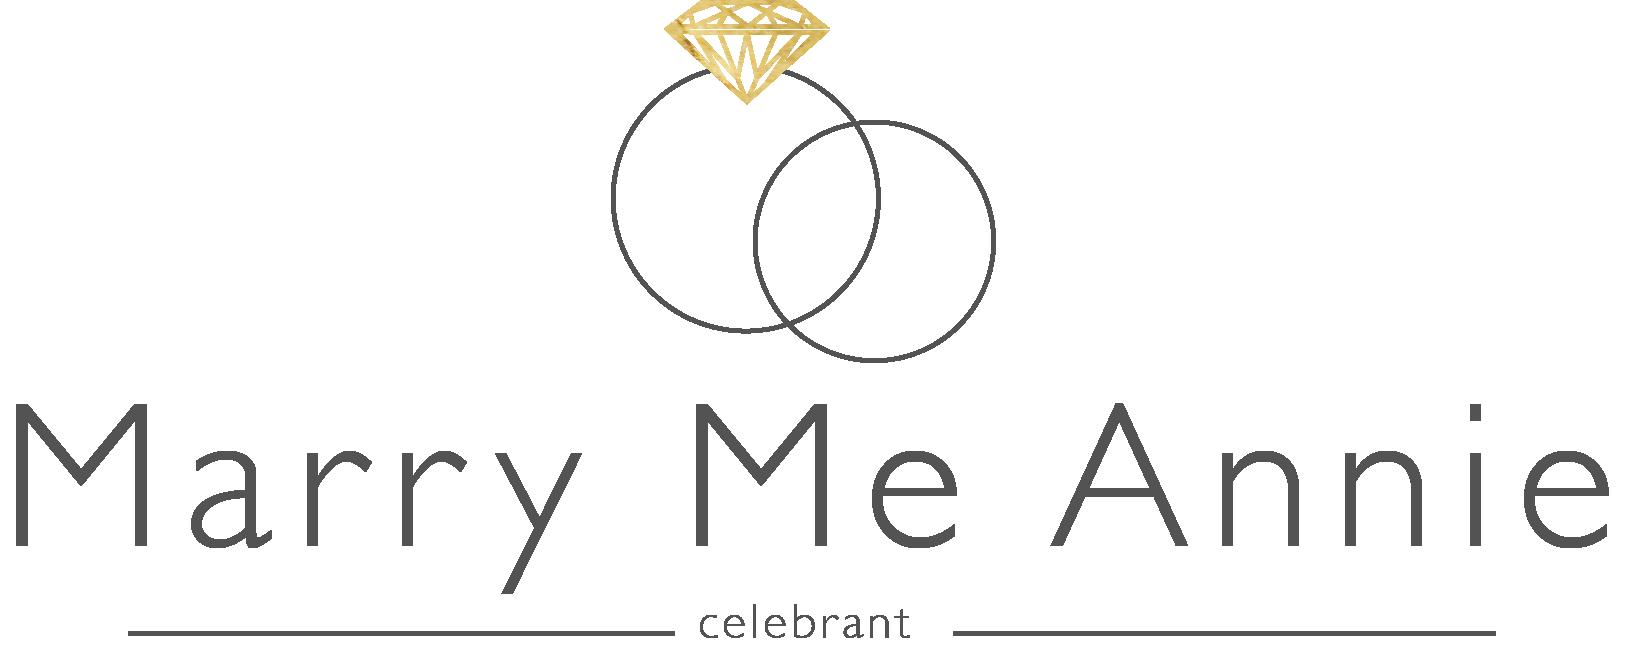 Marry-me-annie-logo